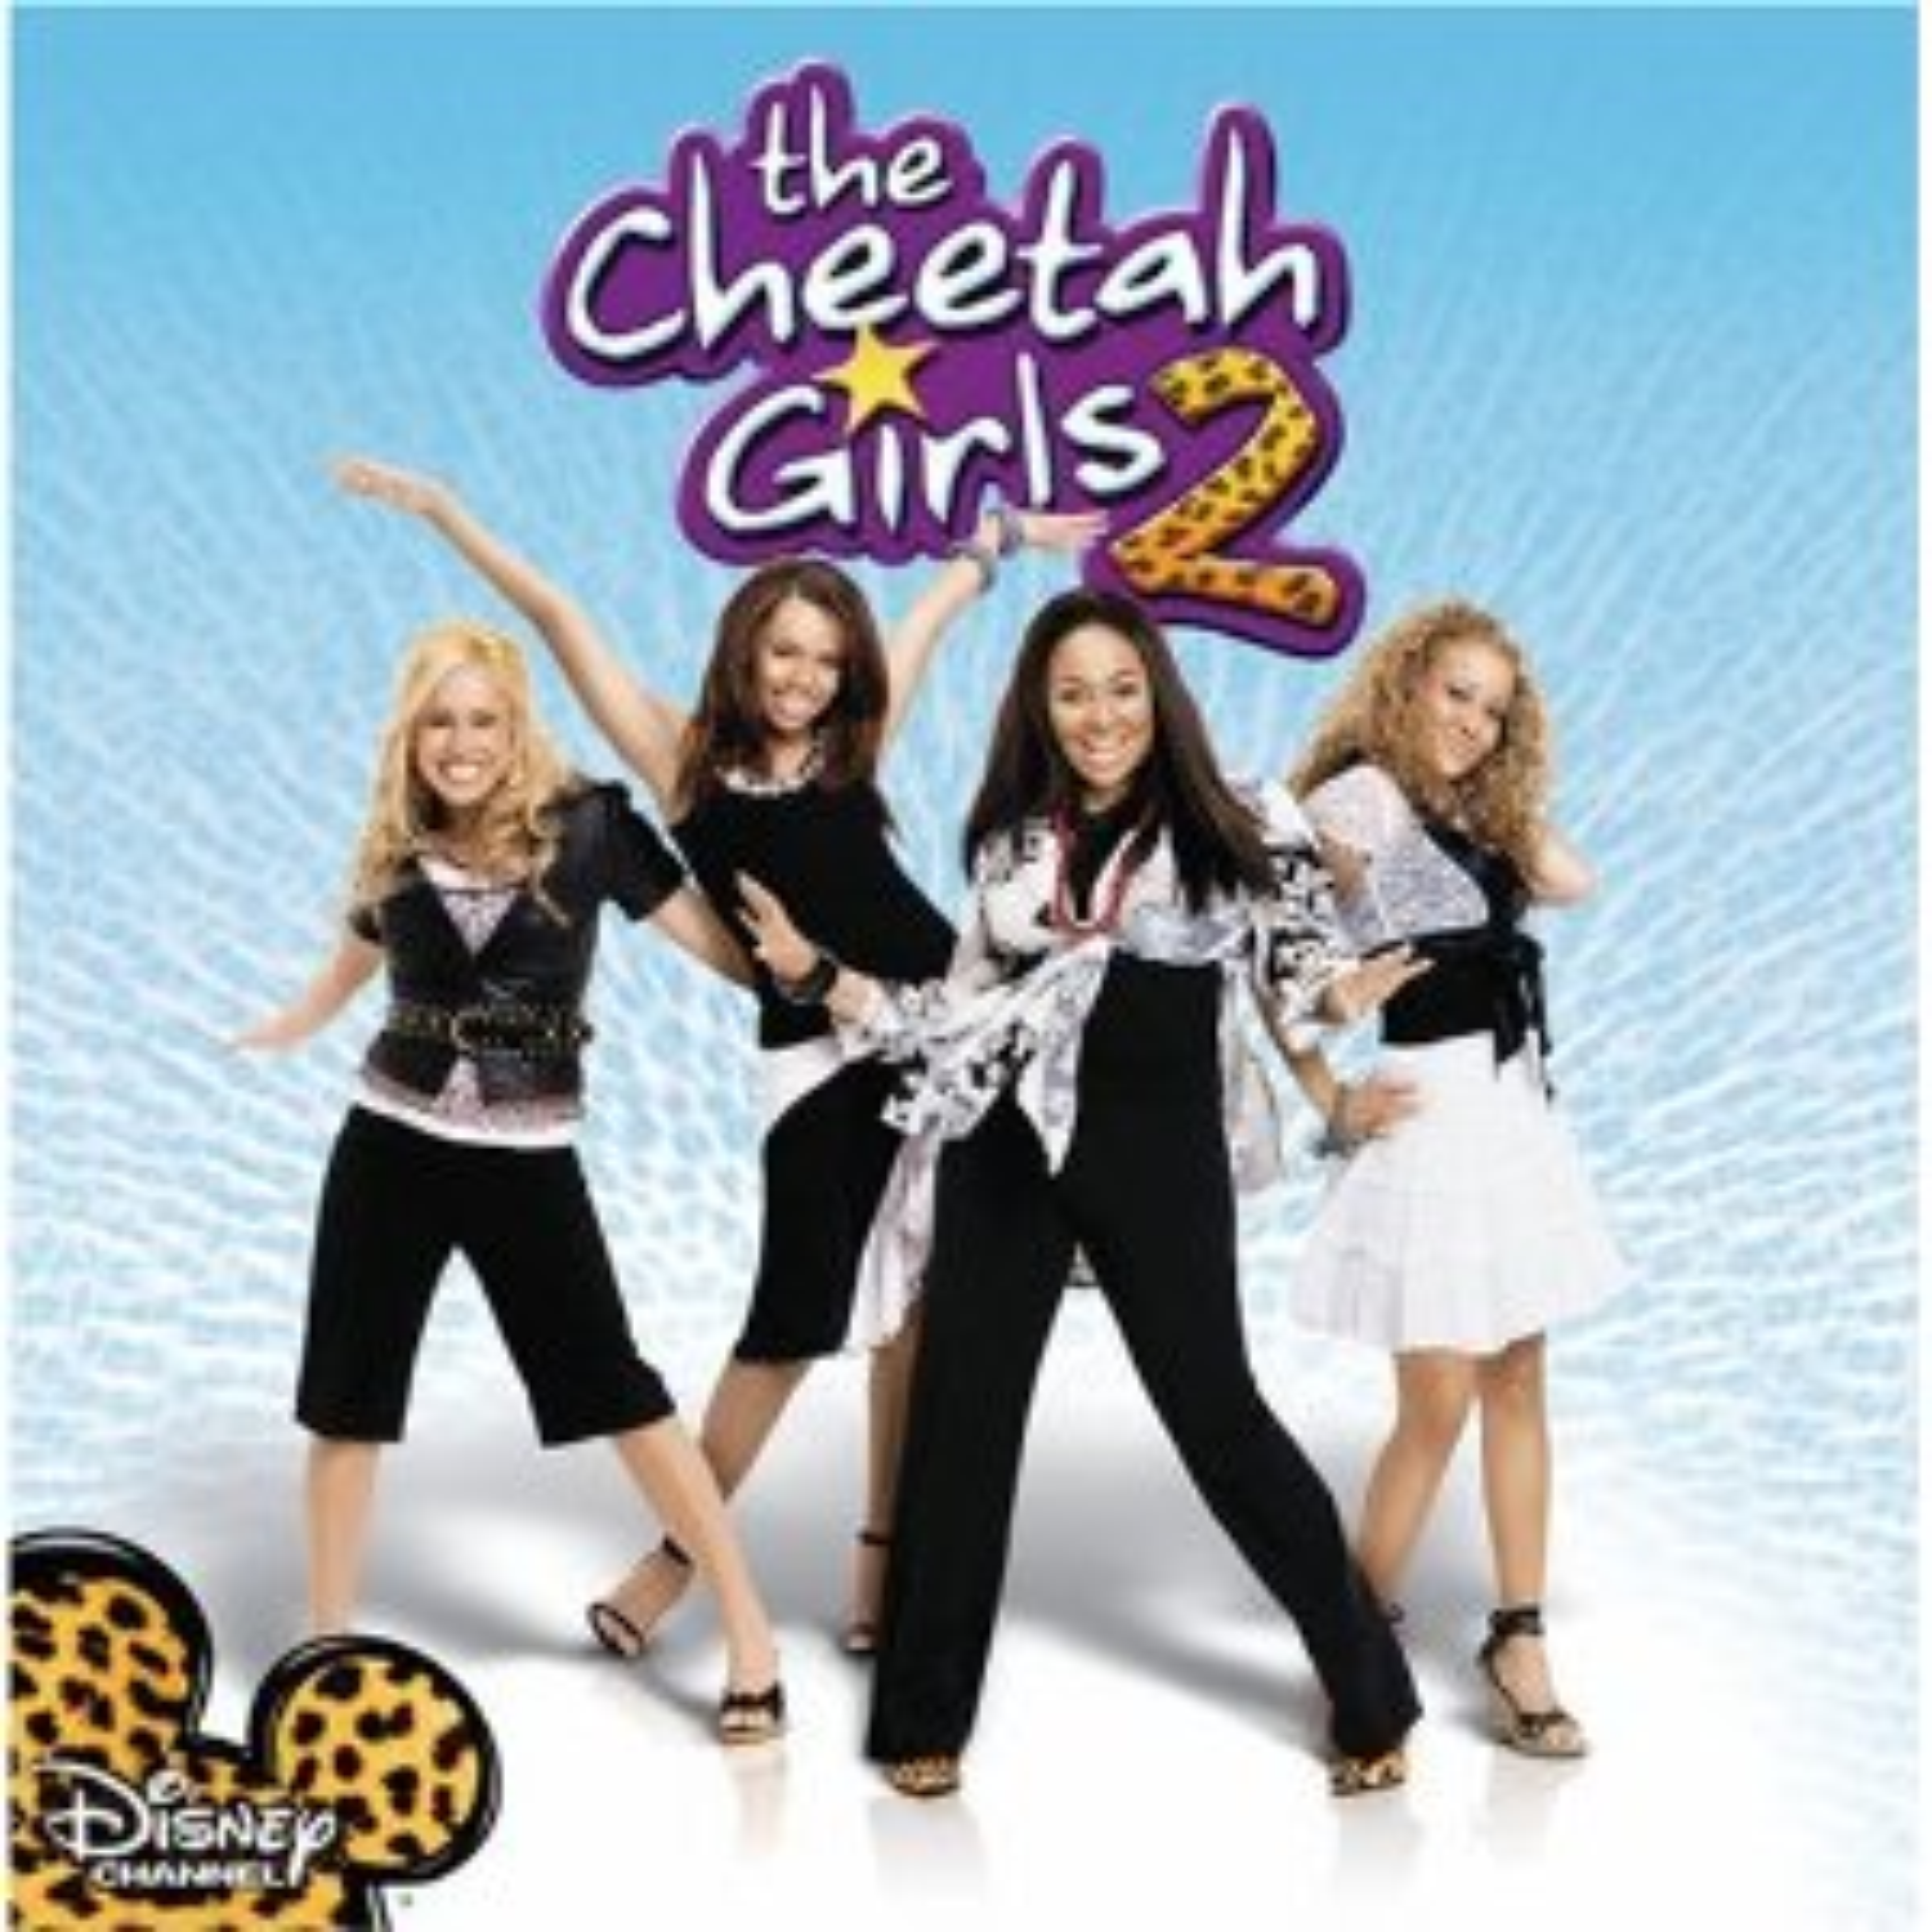 File:The Cheetah Girls 2 OST cover.jpg